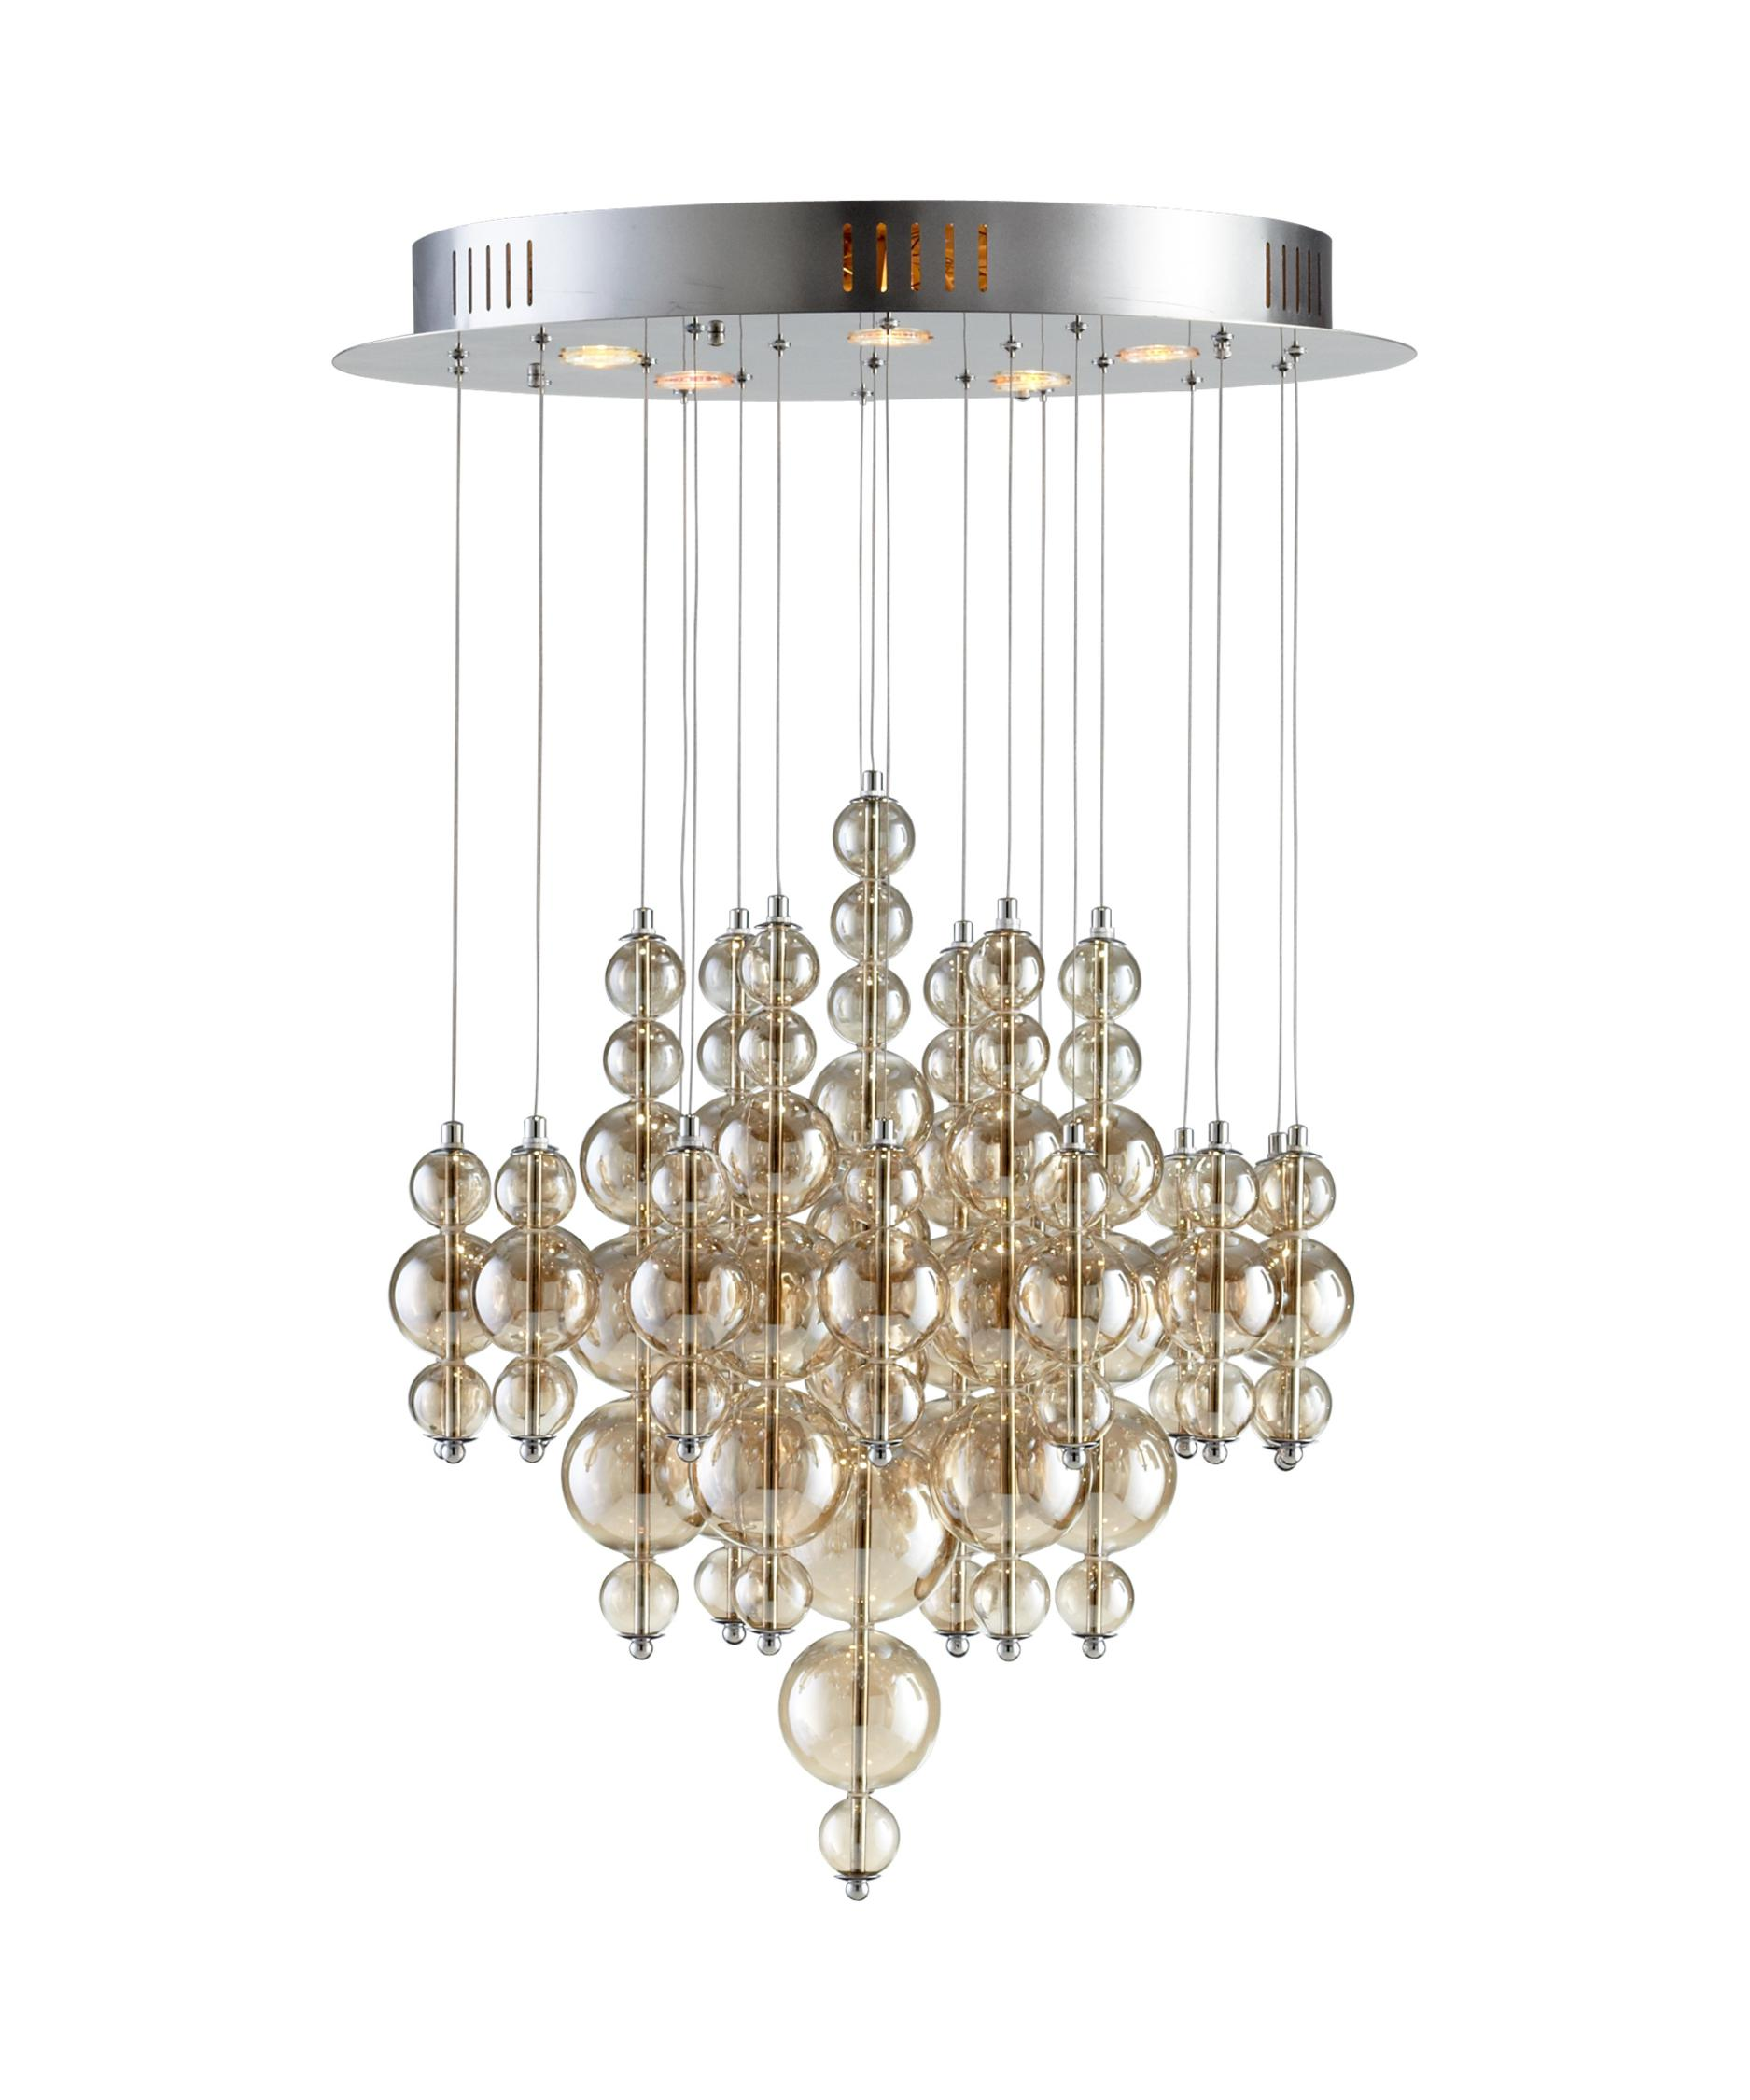 cyan design 05278 bubbles multi pendant light | capitol lighting 1